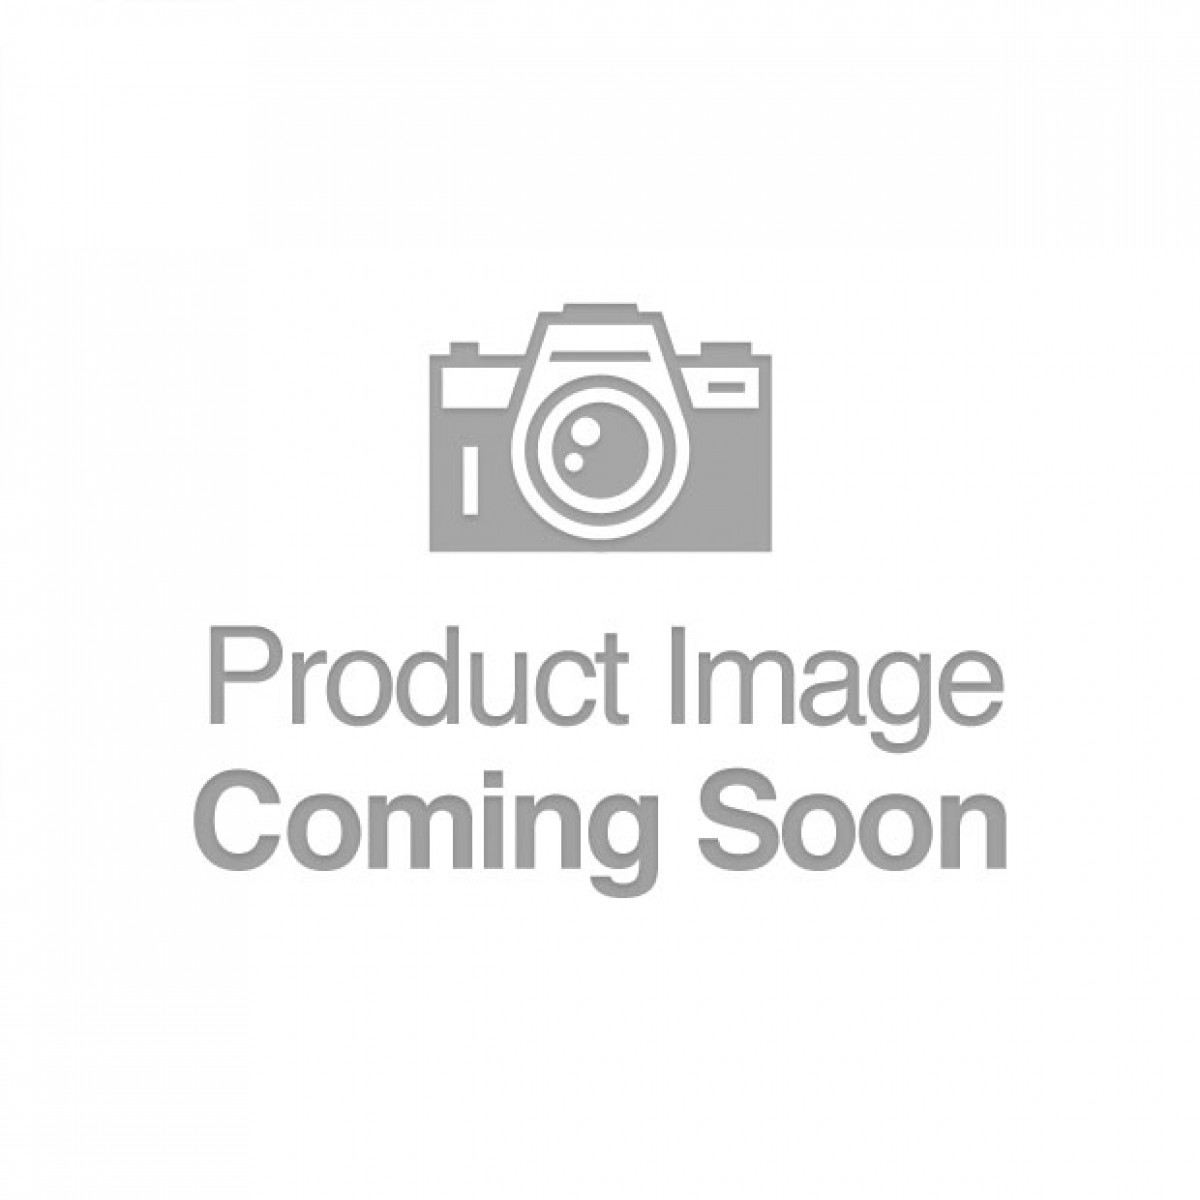 Blush Performance VX101 Male Enhancement Pump - Blue